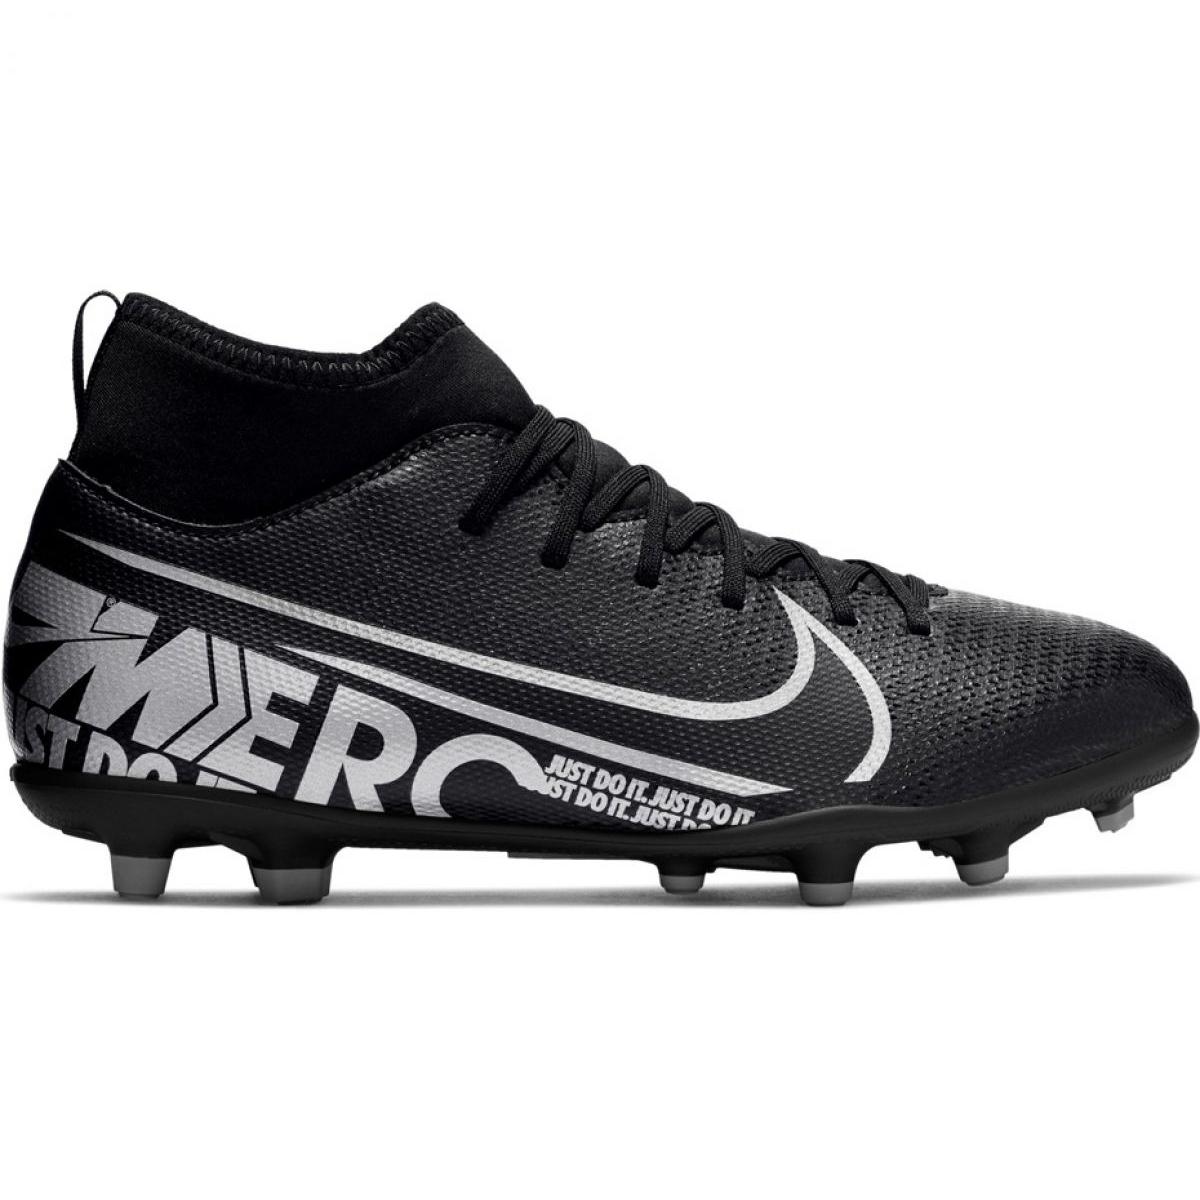 Bigote índice Descifrar  Football shoes Nike Mercurial Superfly 7 Club FG / MG Jr AT8150-001 black  pink - ButyModne.pl